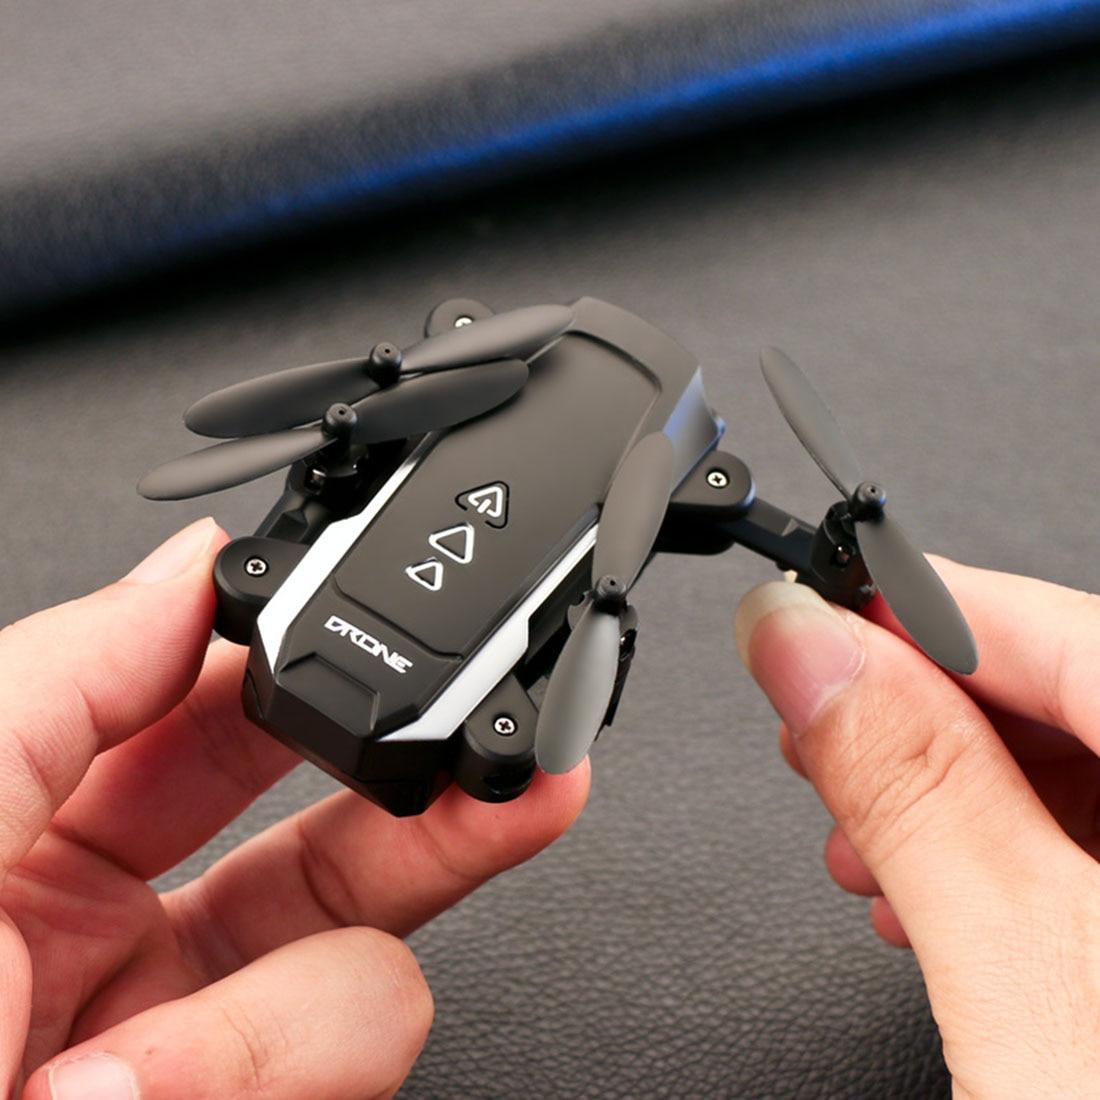 KK8 Foldable Mini drones Drone RC FPV Quadcopter HD Camera Wifi FPV Dron Selfie RC Helicopter juguetes Toys квадрокоптер